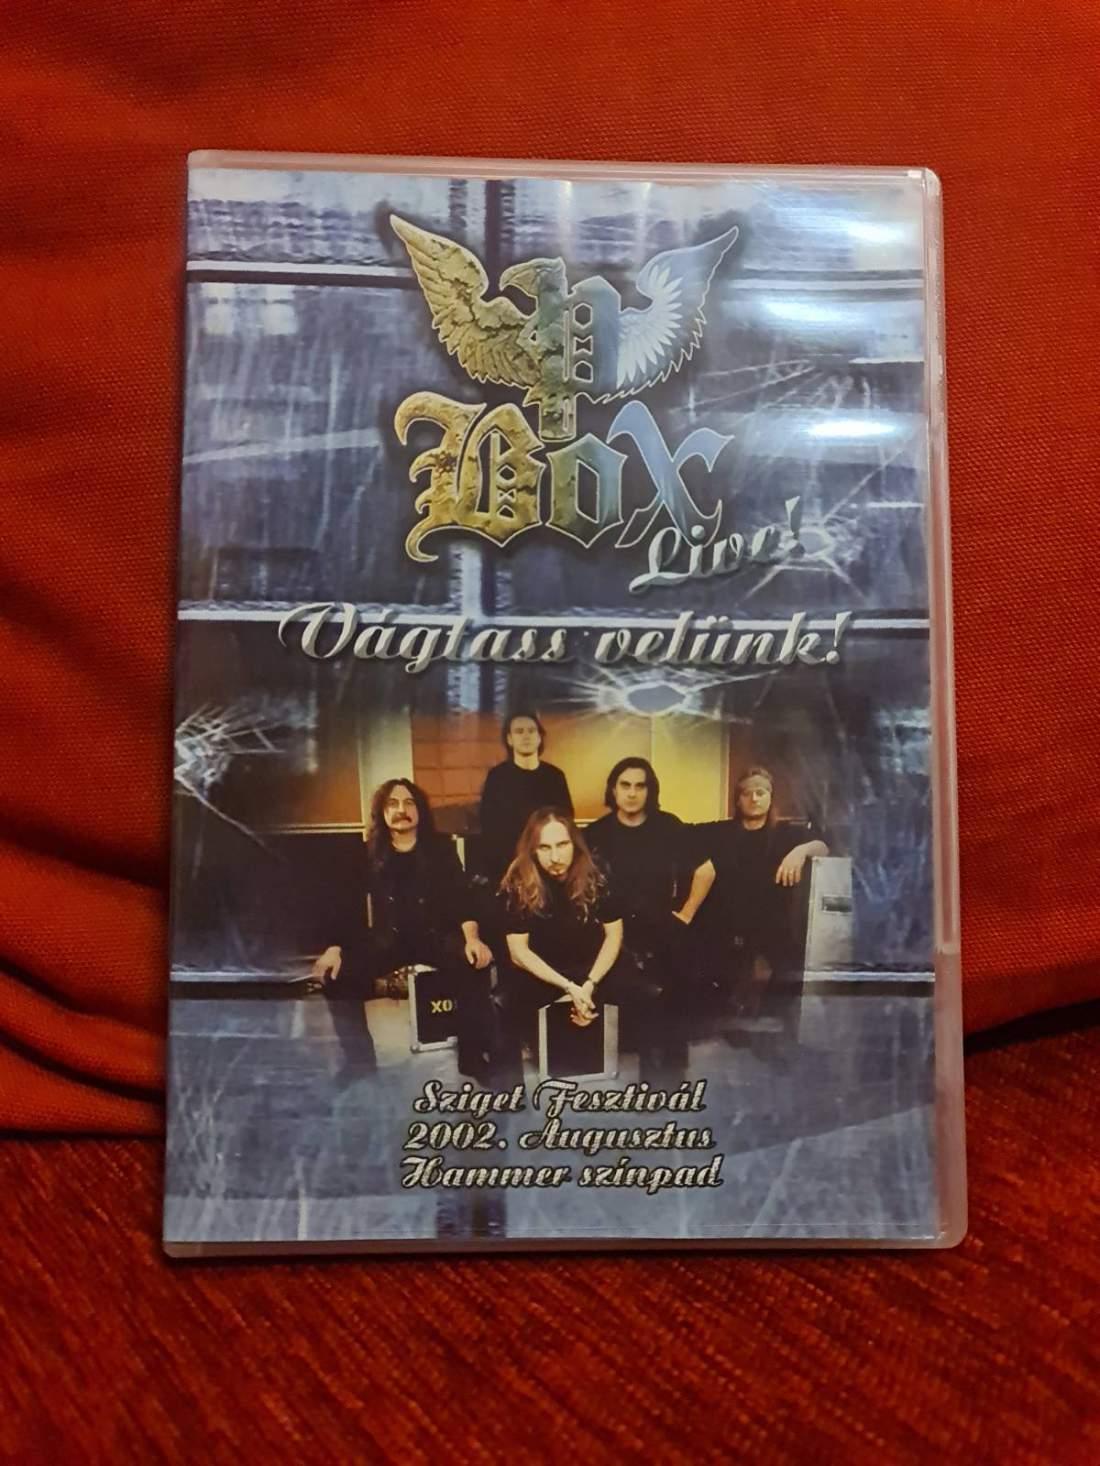 P. BOX - VÁGTASS VELÜNK! LIVE DVD